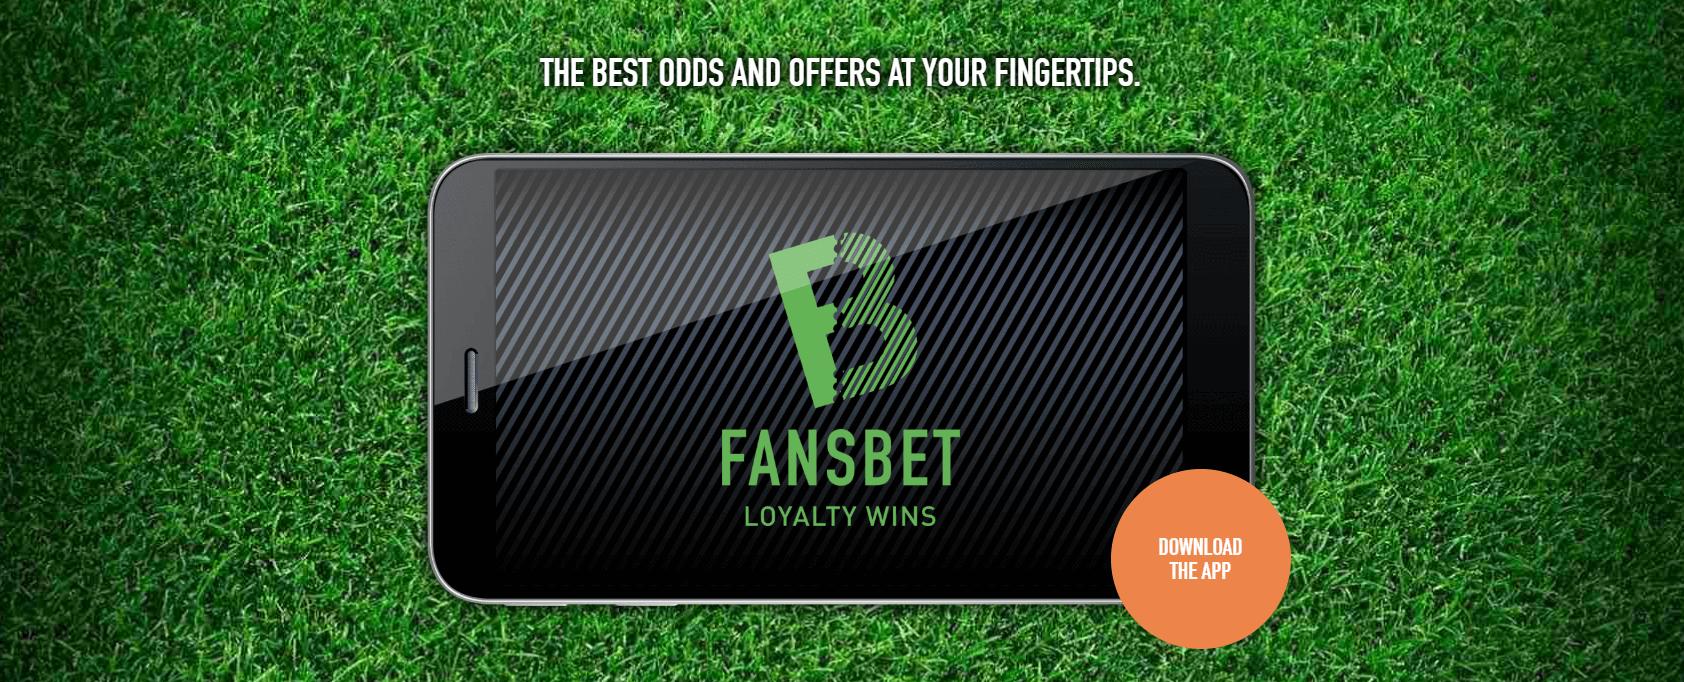 fansbet mobile application